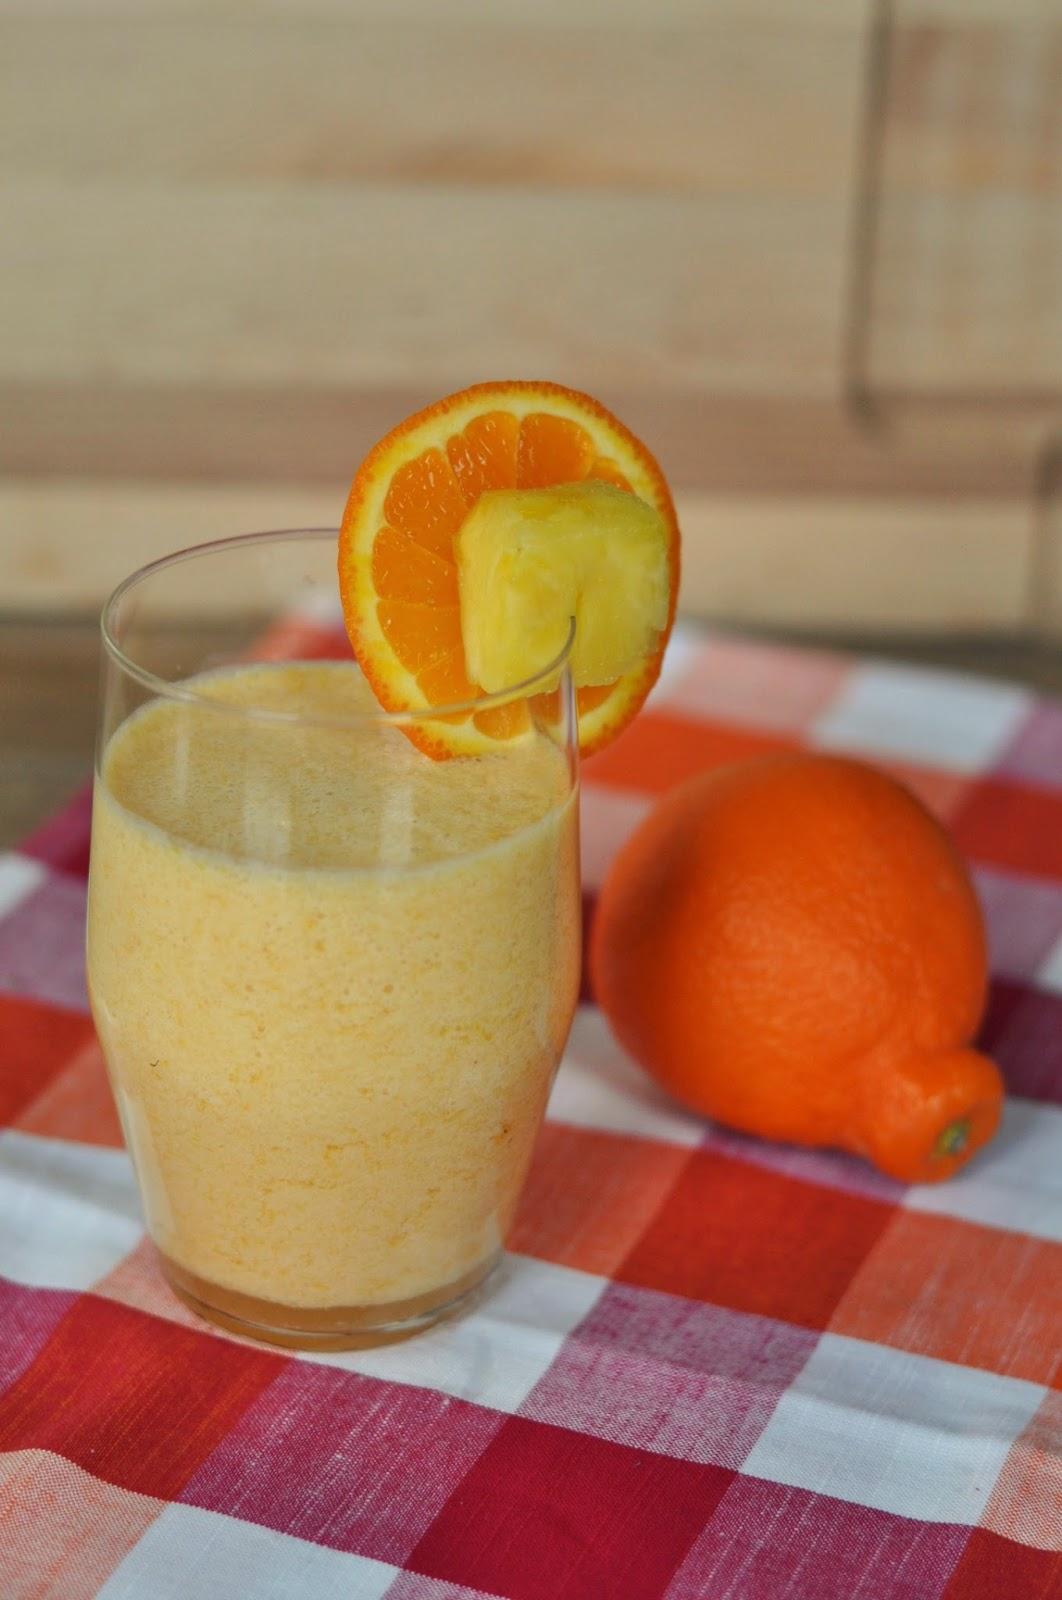 http://www.justusfourblog.com/2014/05/citrus-vanilla-breakfast-smoothie/